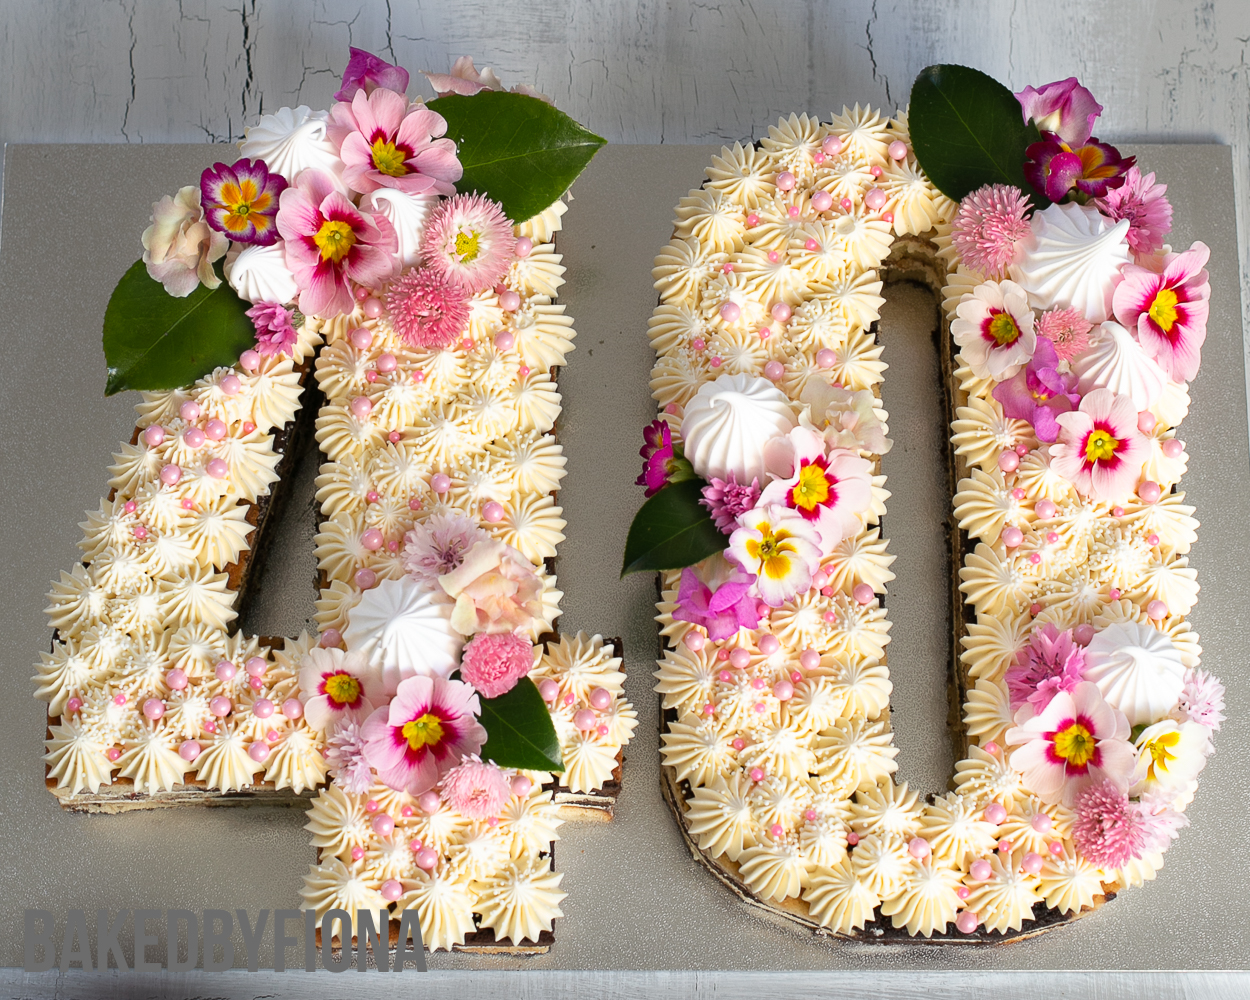 2018 BakedByFiona 40th birthday number cake